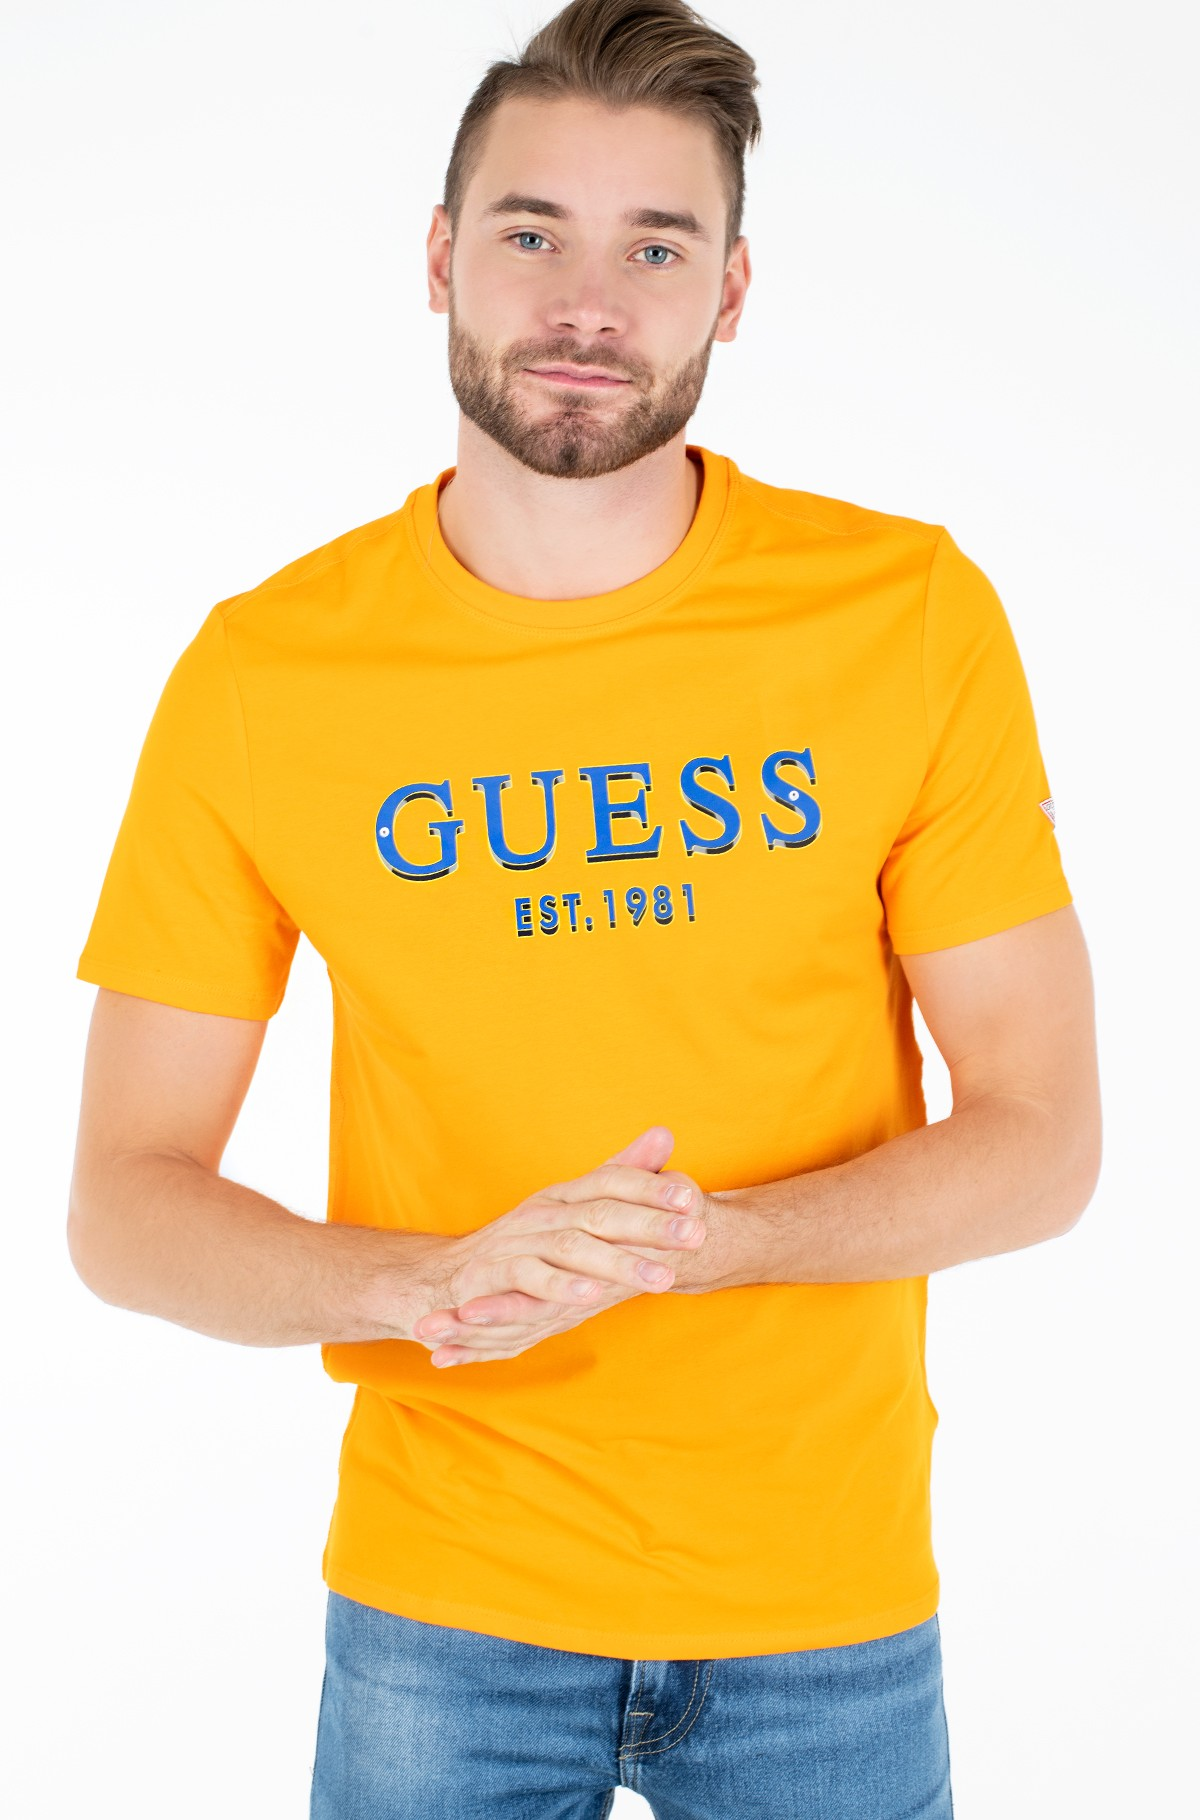 T-shirt M0BI59 J1300-full-1